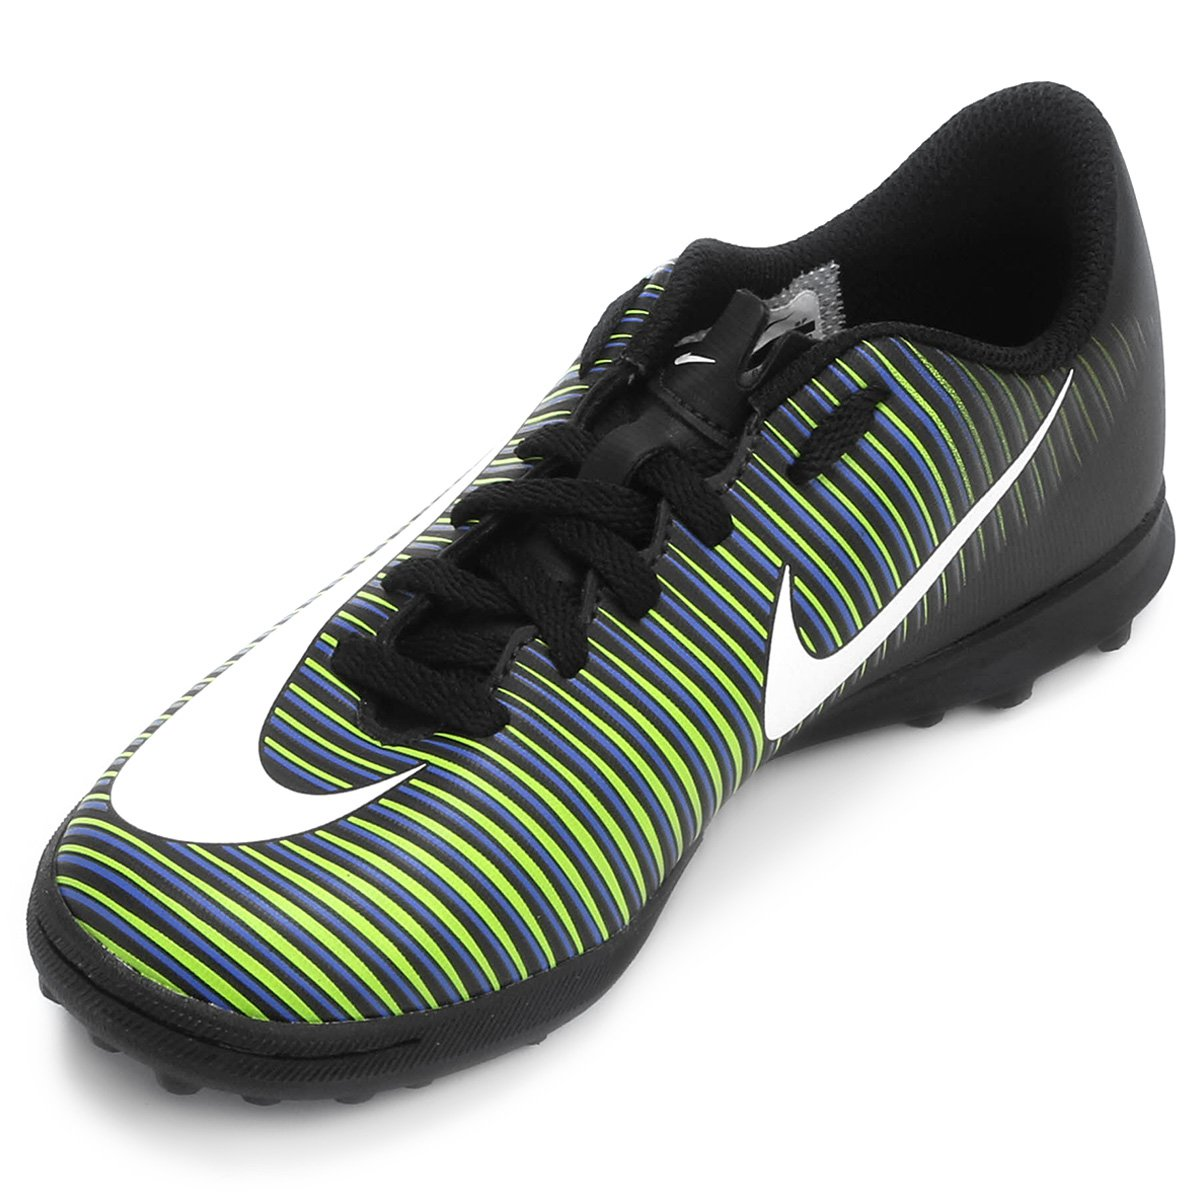 Chuteira Society Infantil Nike Mercurial Vortex 3 TF - Compre Agora ... 4103013eee35c